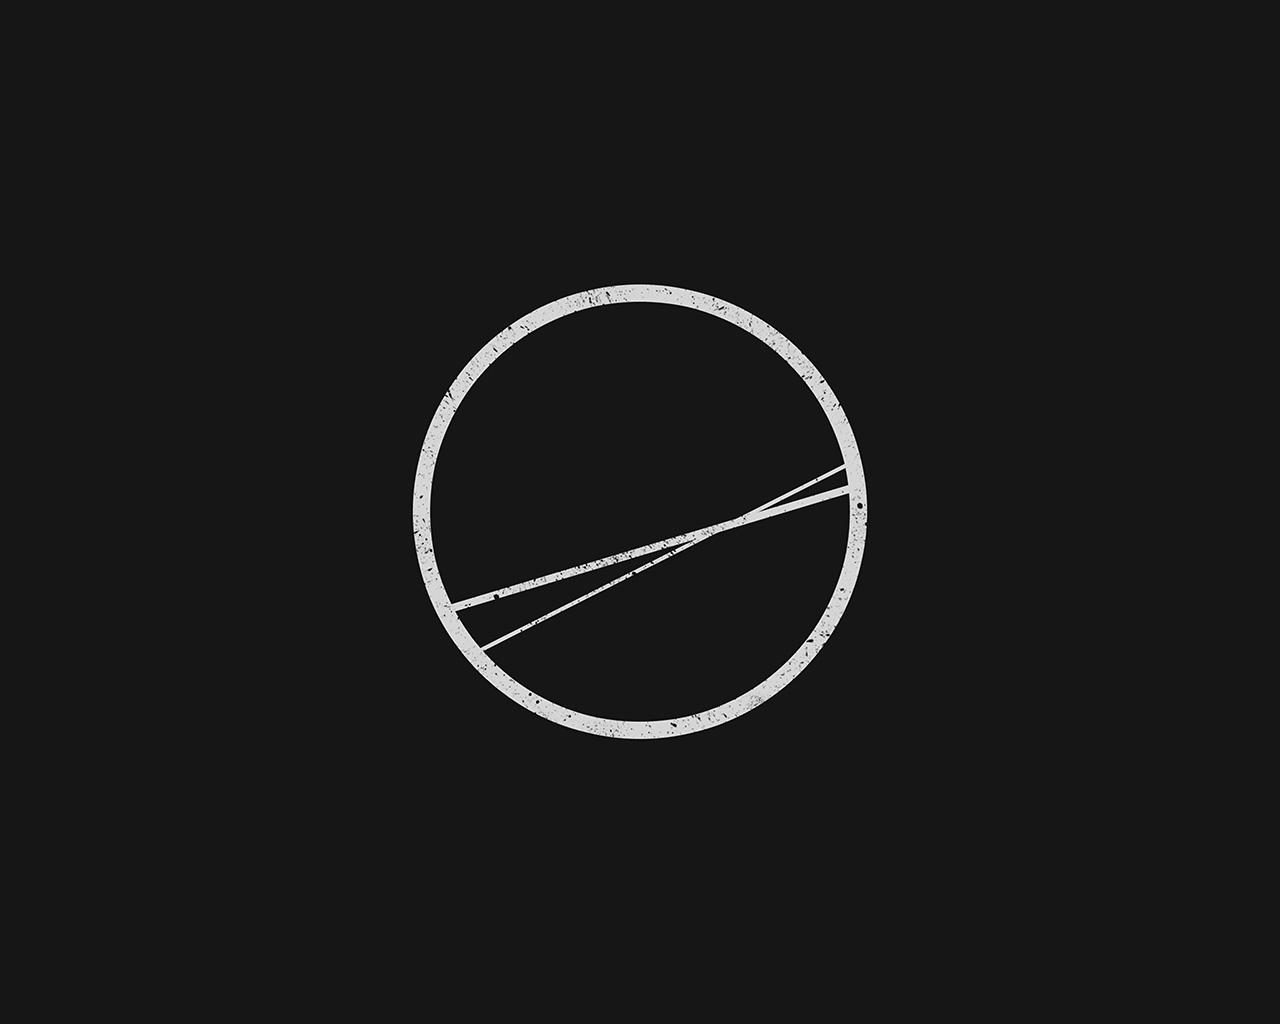 Simple Minimalist Ipad Wallpaper: Bc77-minimal-simple-circle-art-illustration-dark-wallpaper